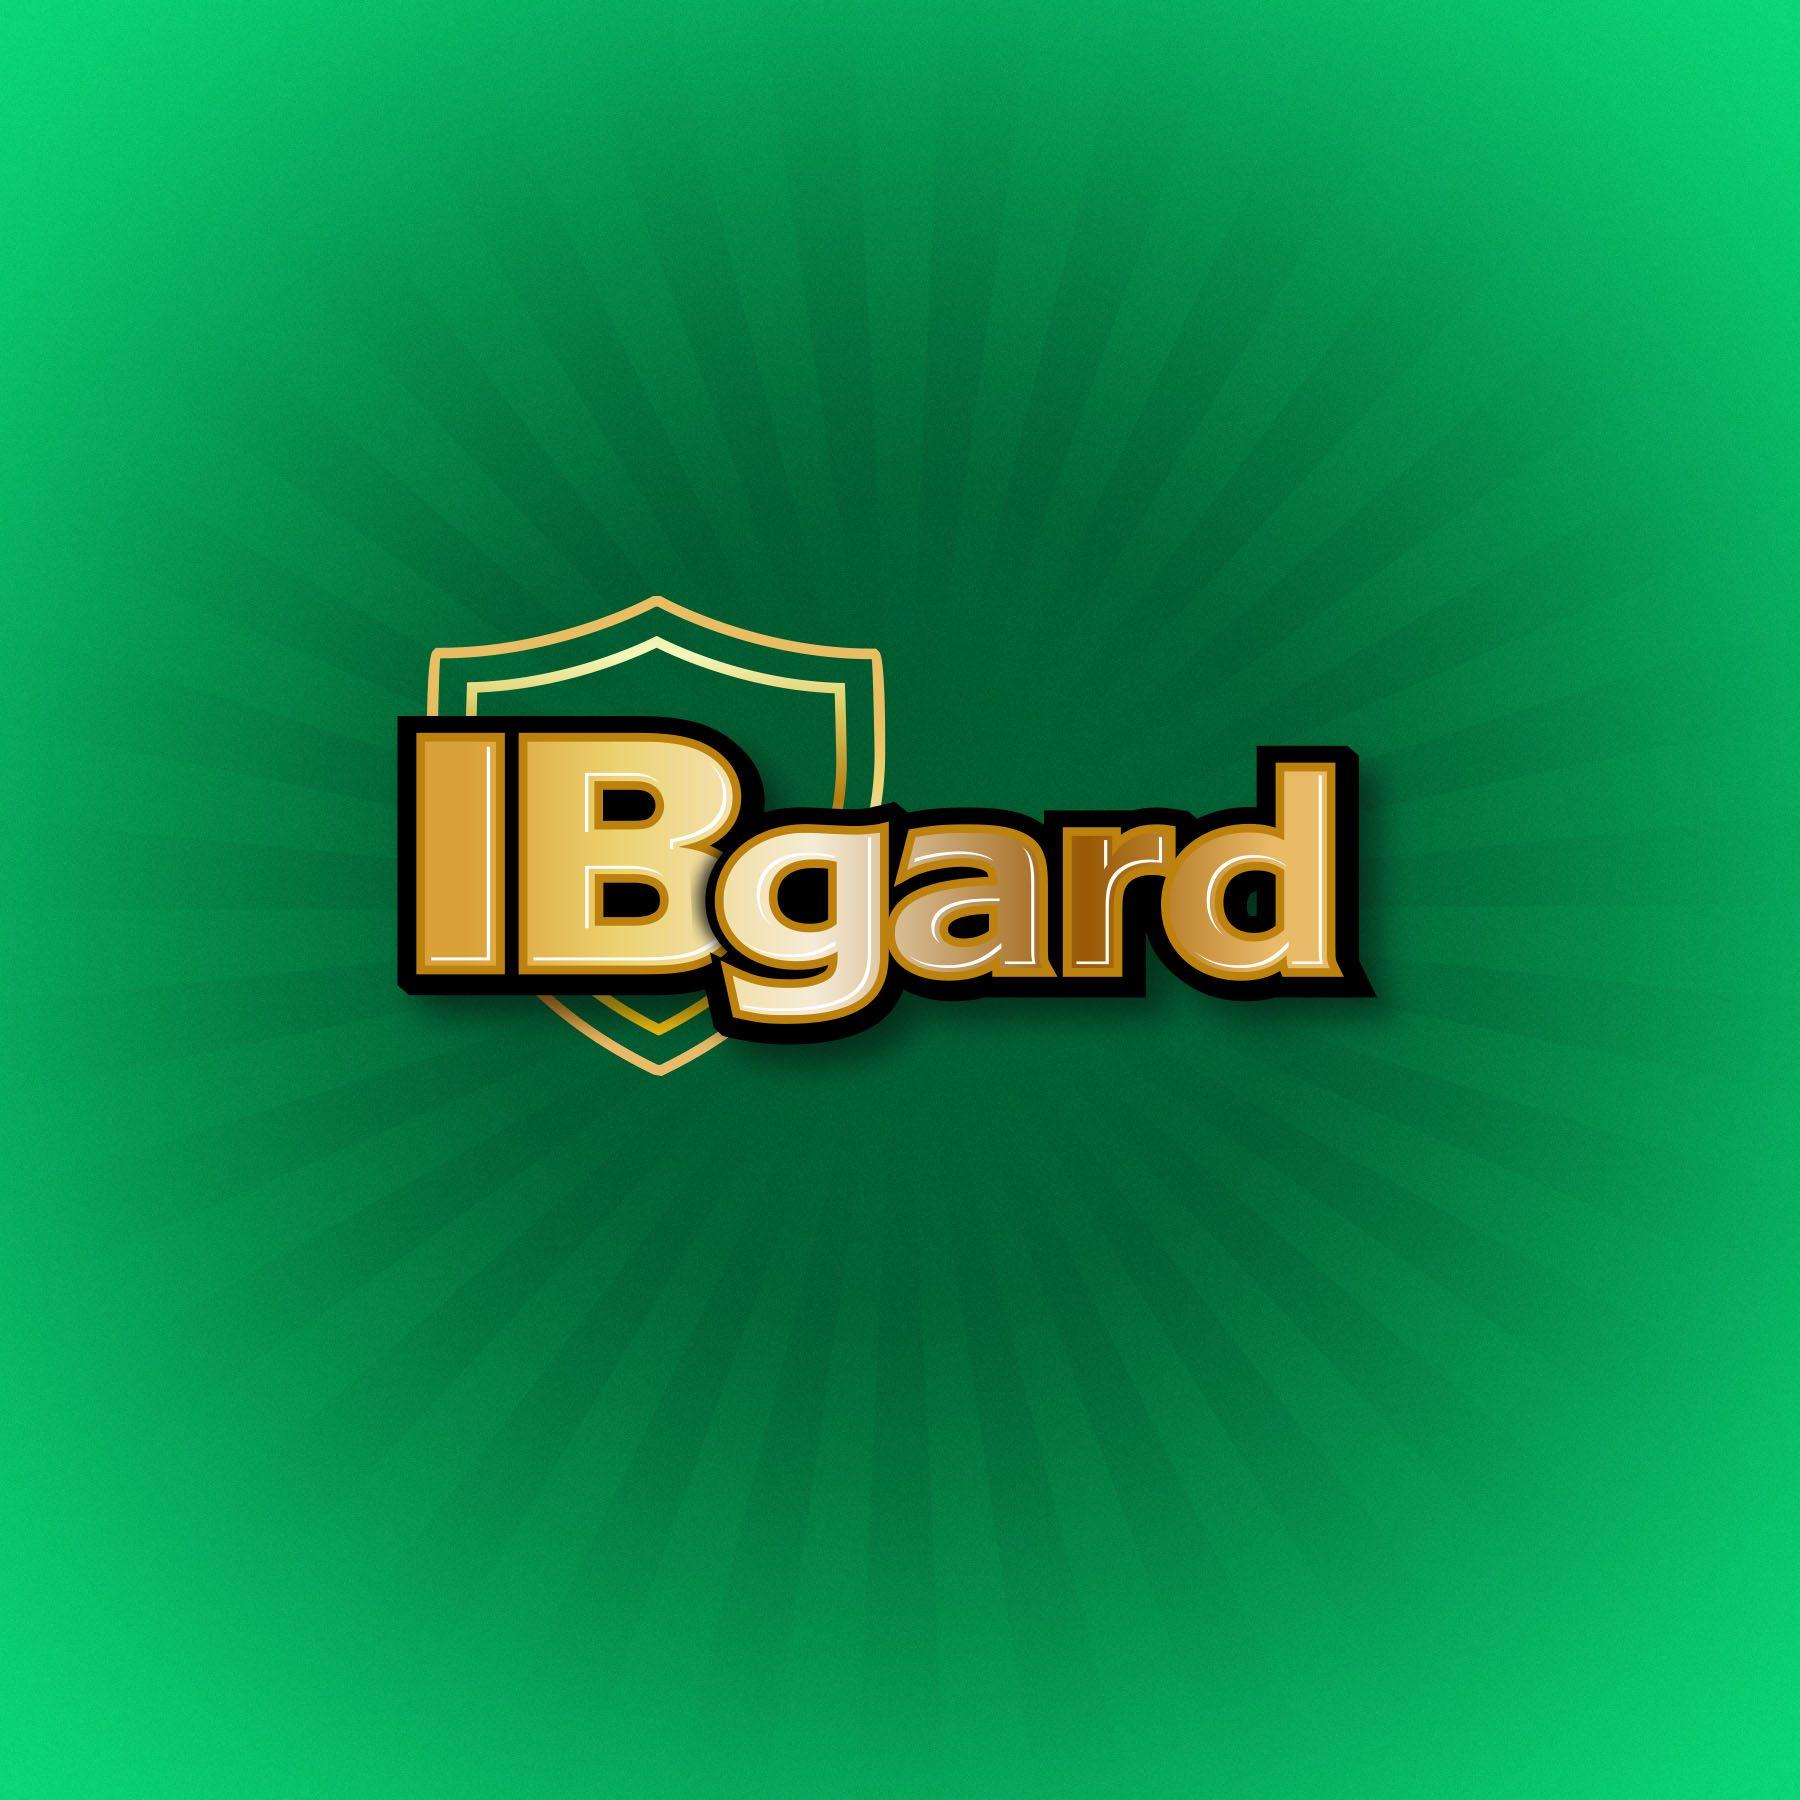 IBgard Logo